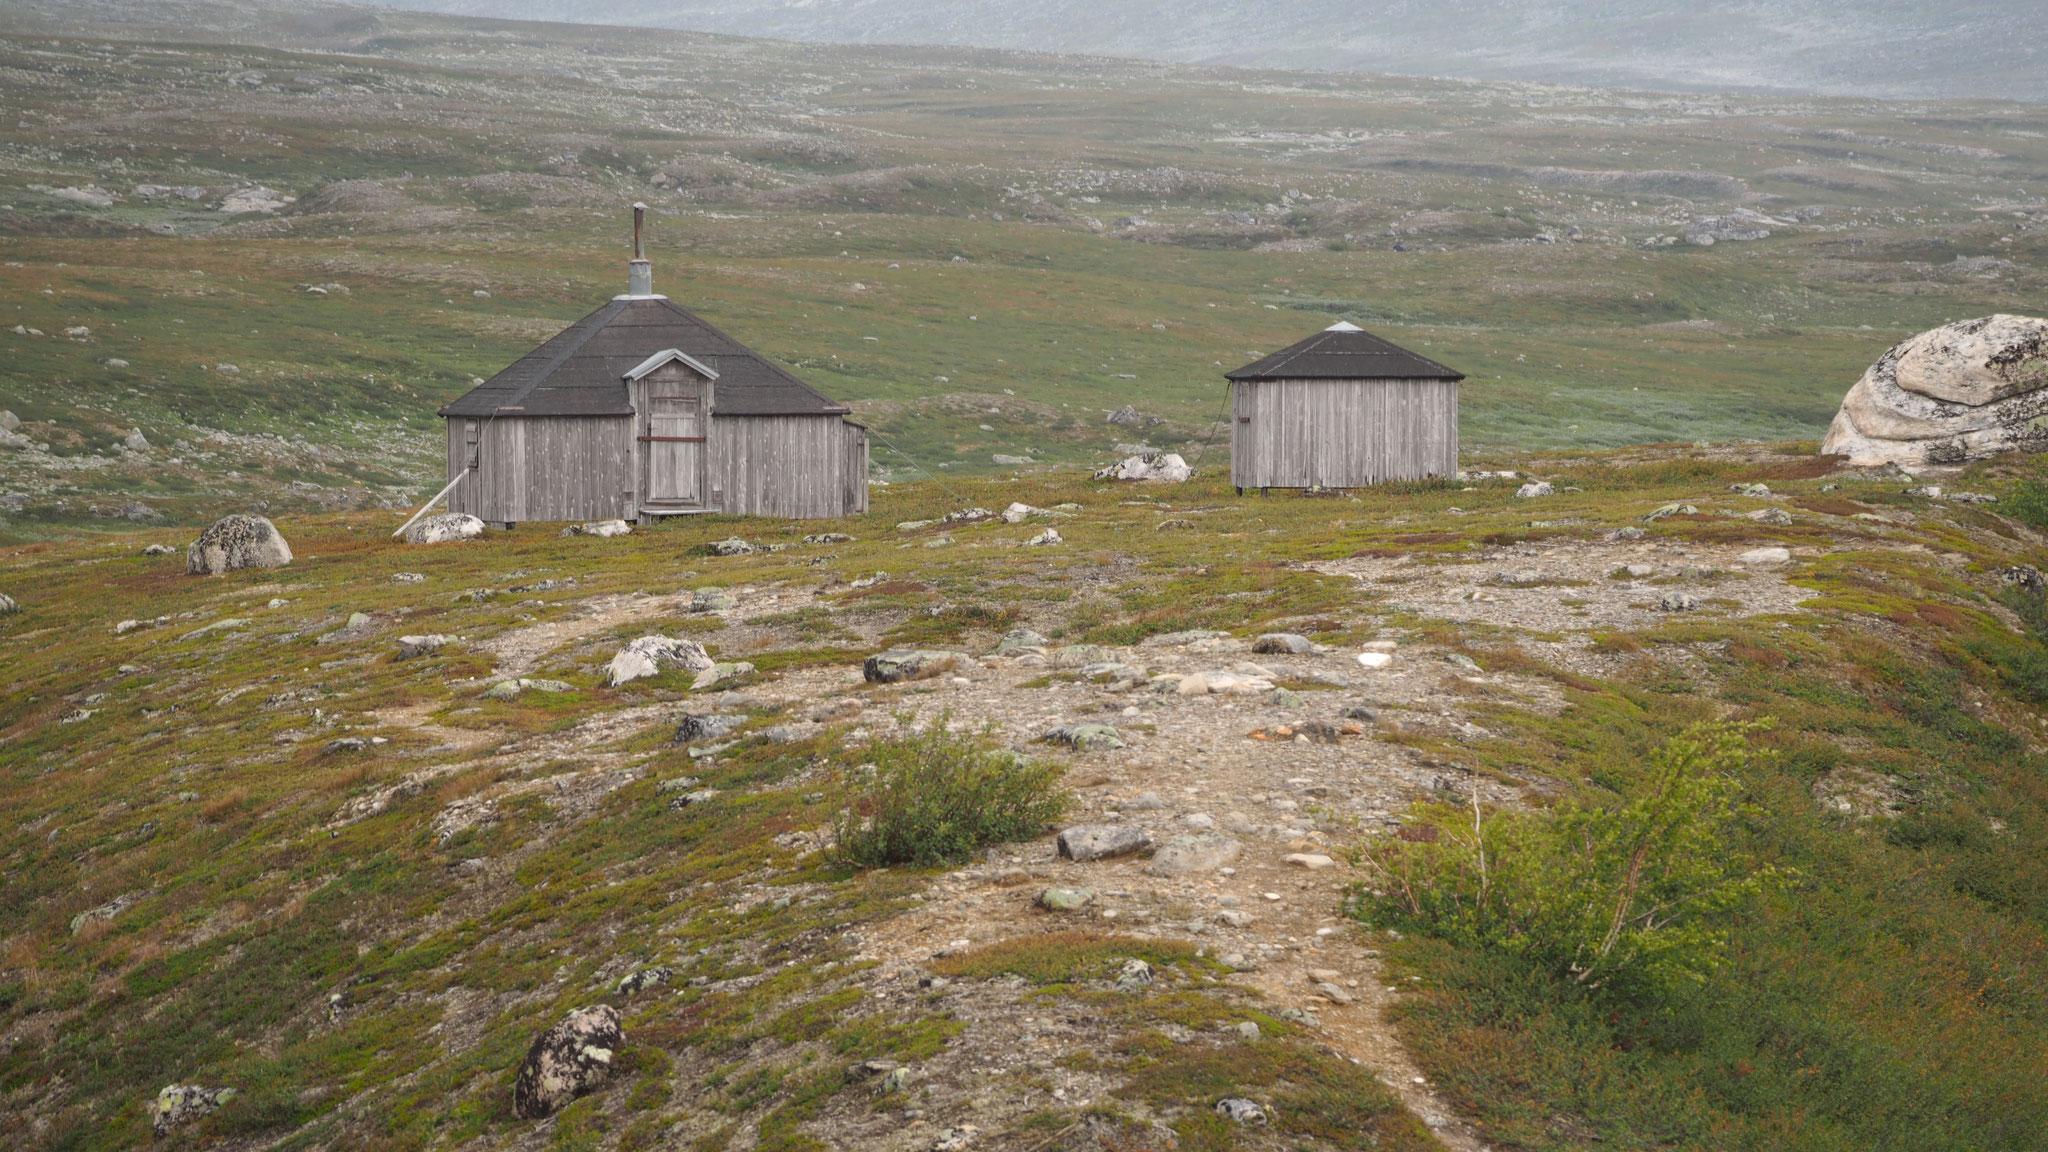 Hütten am Polarkreis